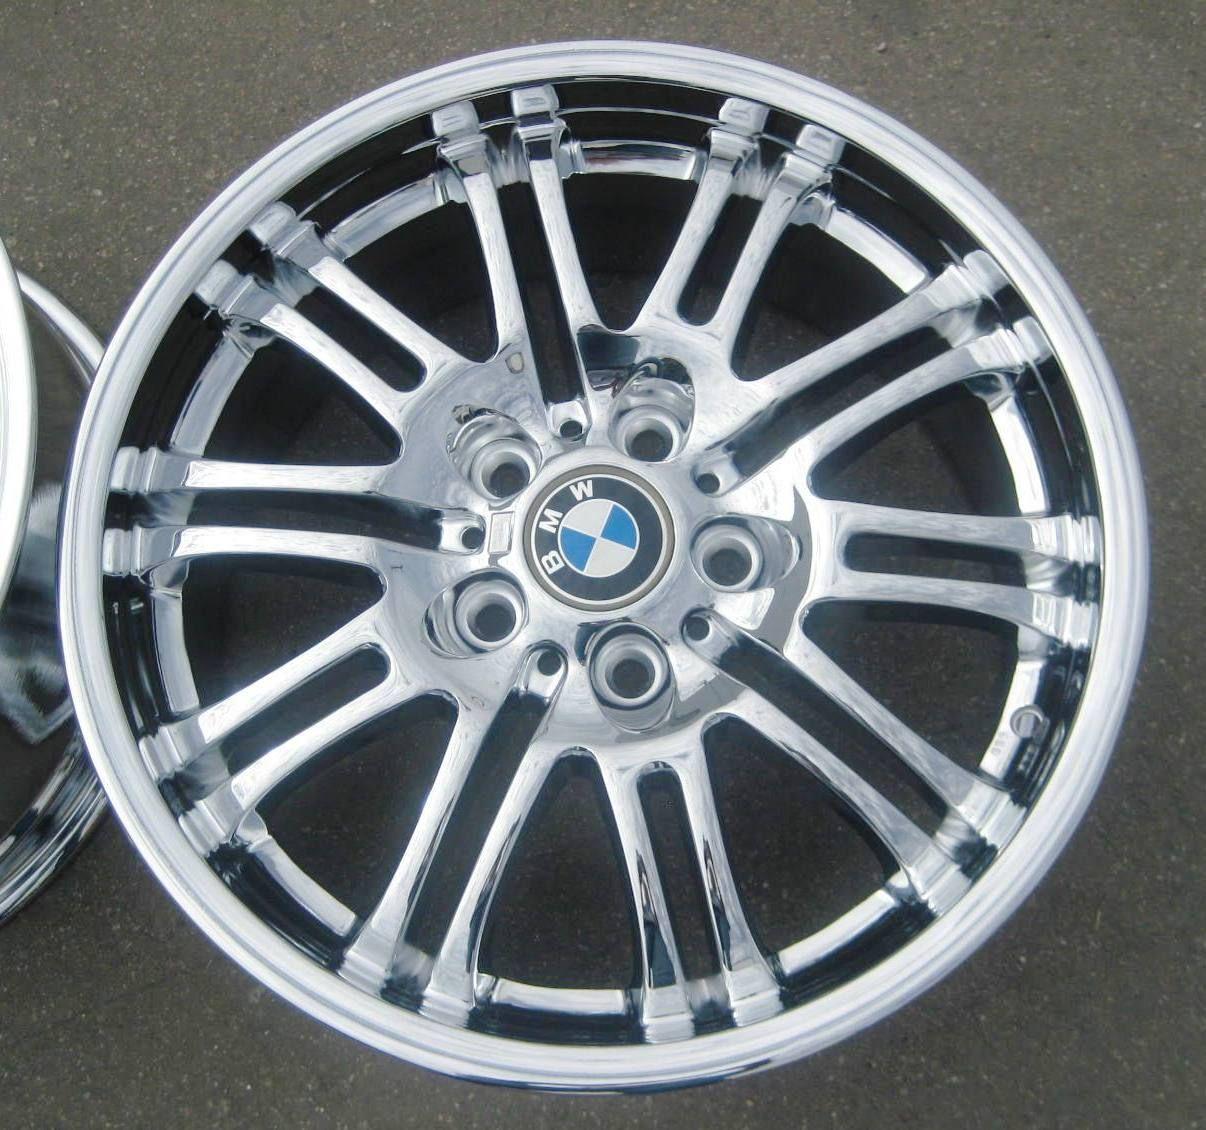 Factory BMW M3 Z3 Z4 335i Chrome Wheels Rims Style 67 Set of 4